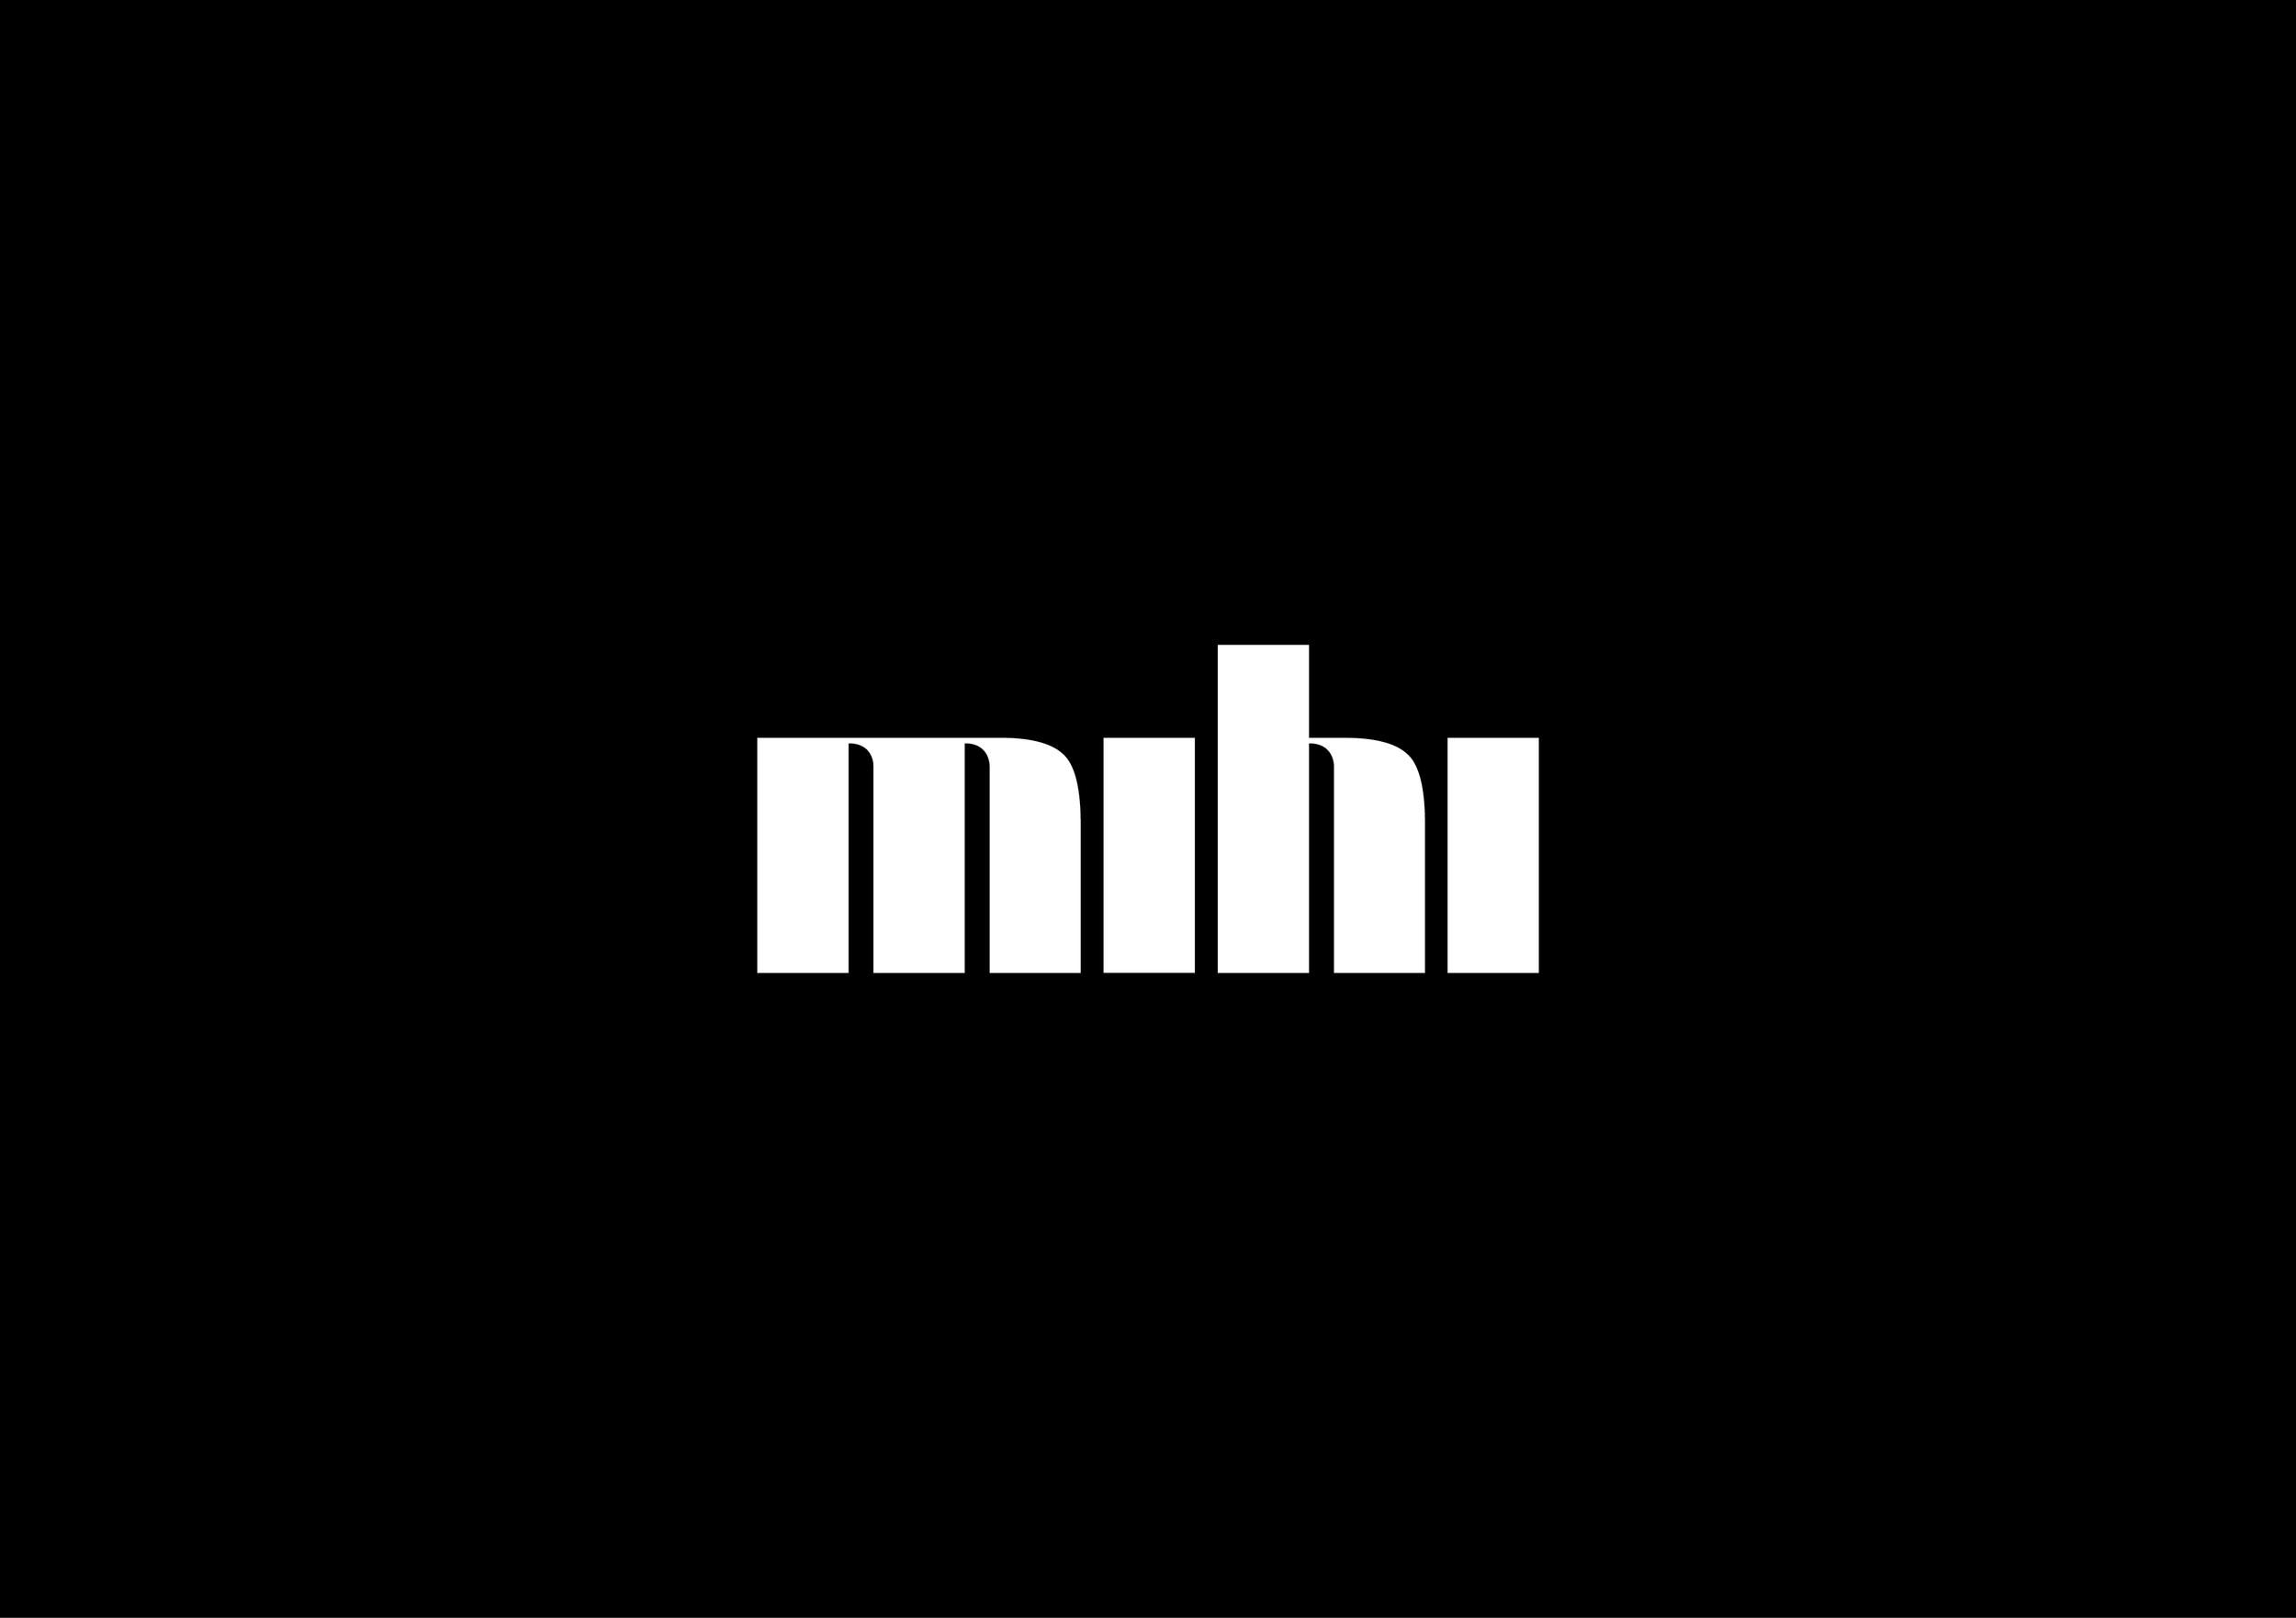 Marque_Logos_20.png